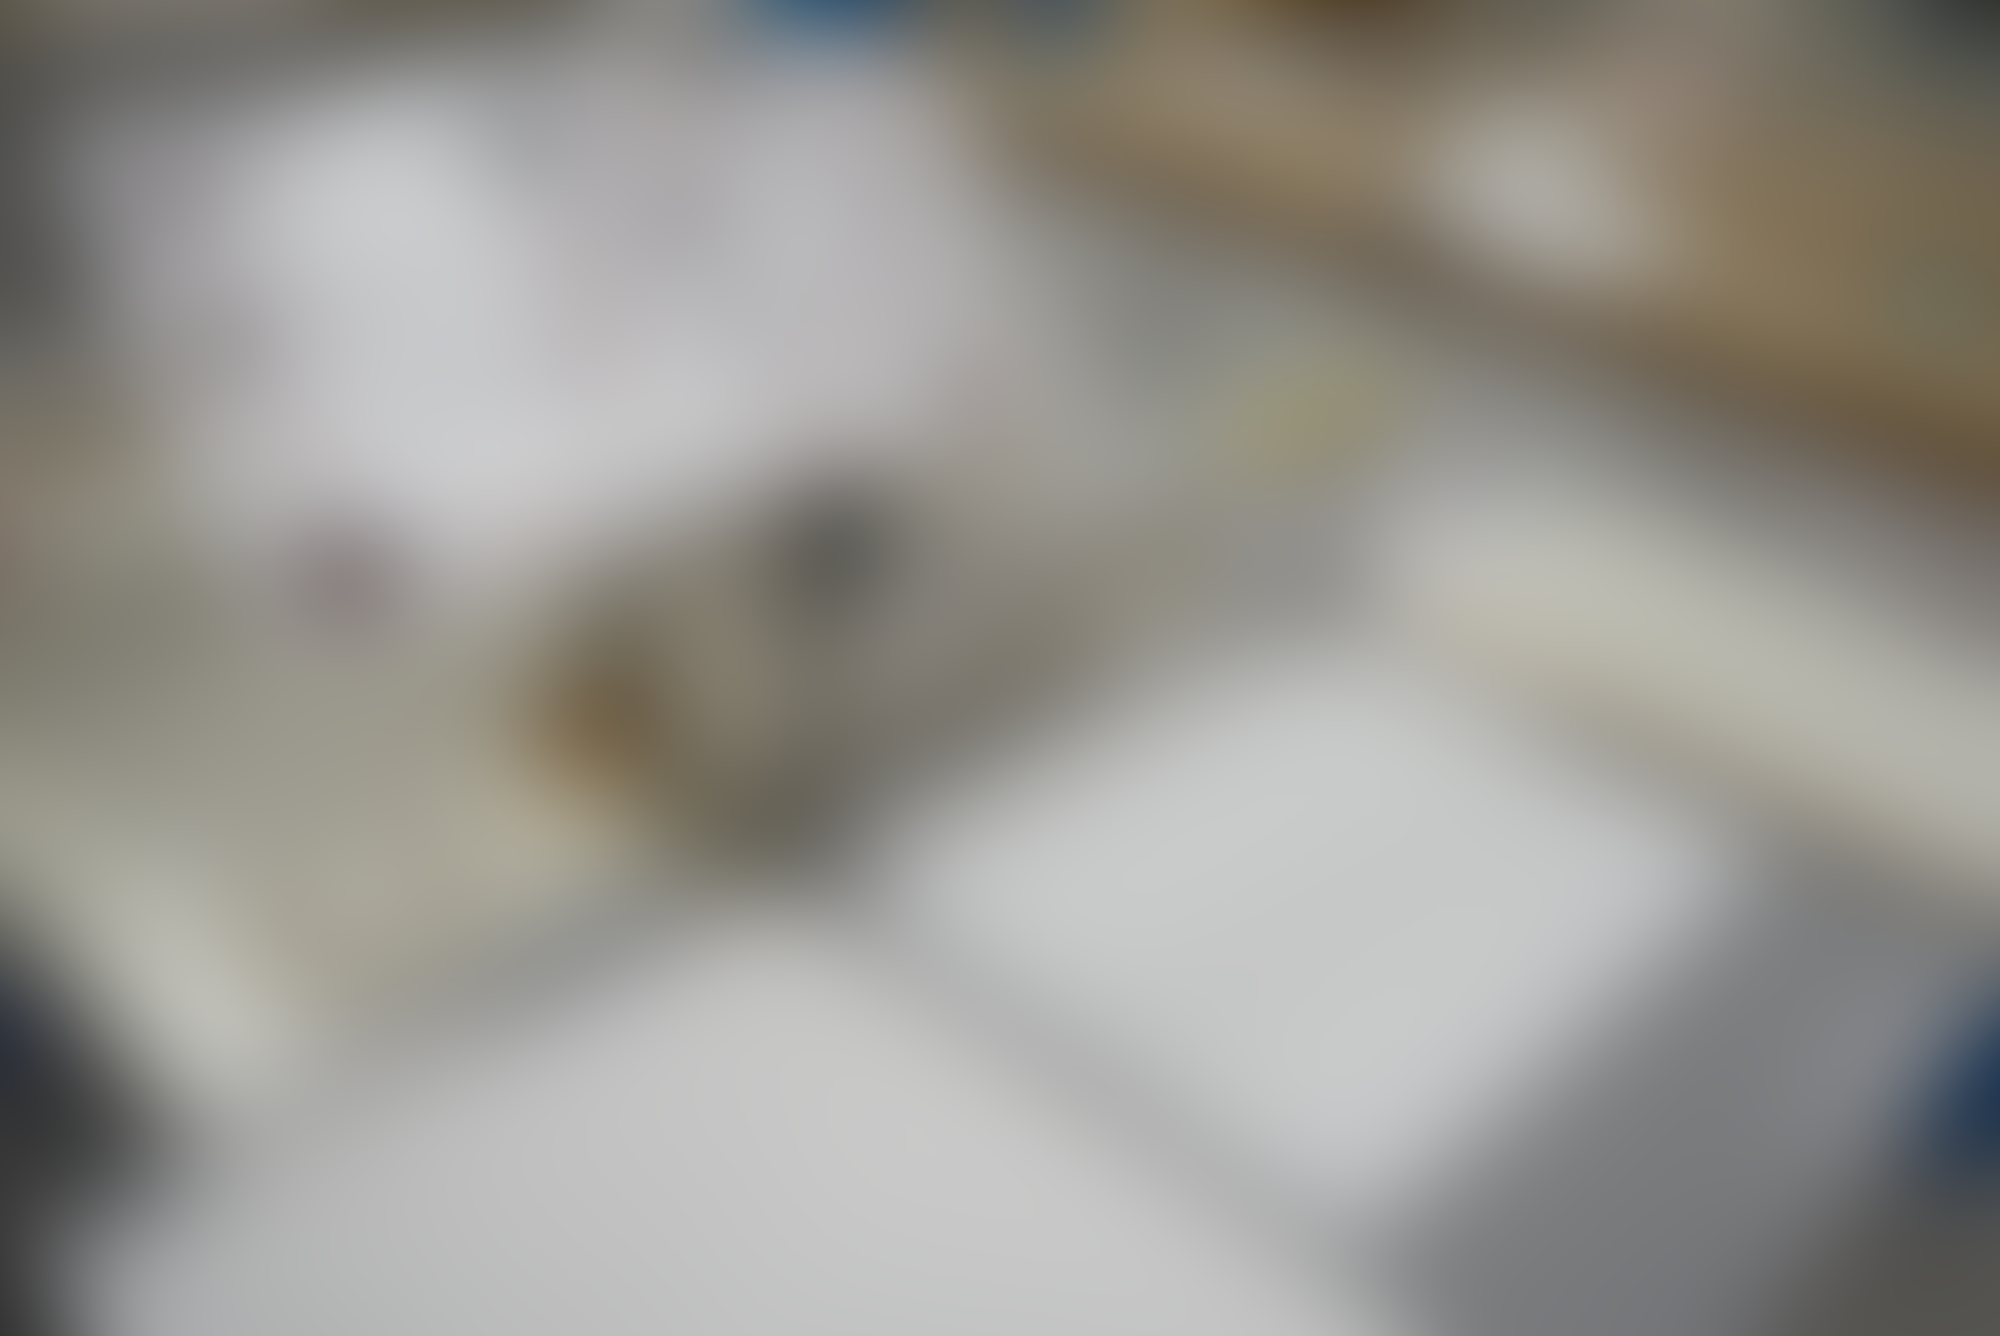 Gfsmith elise lectureinprogress 07 autocompressfitresizeixlibphp 1 1 0max h2000max w3 D2000q80sd8841743b2c8d784a9017547fcd807ce